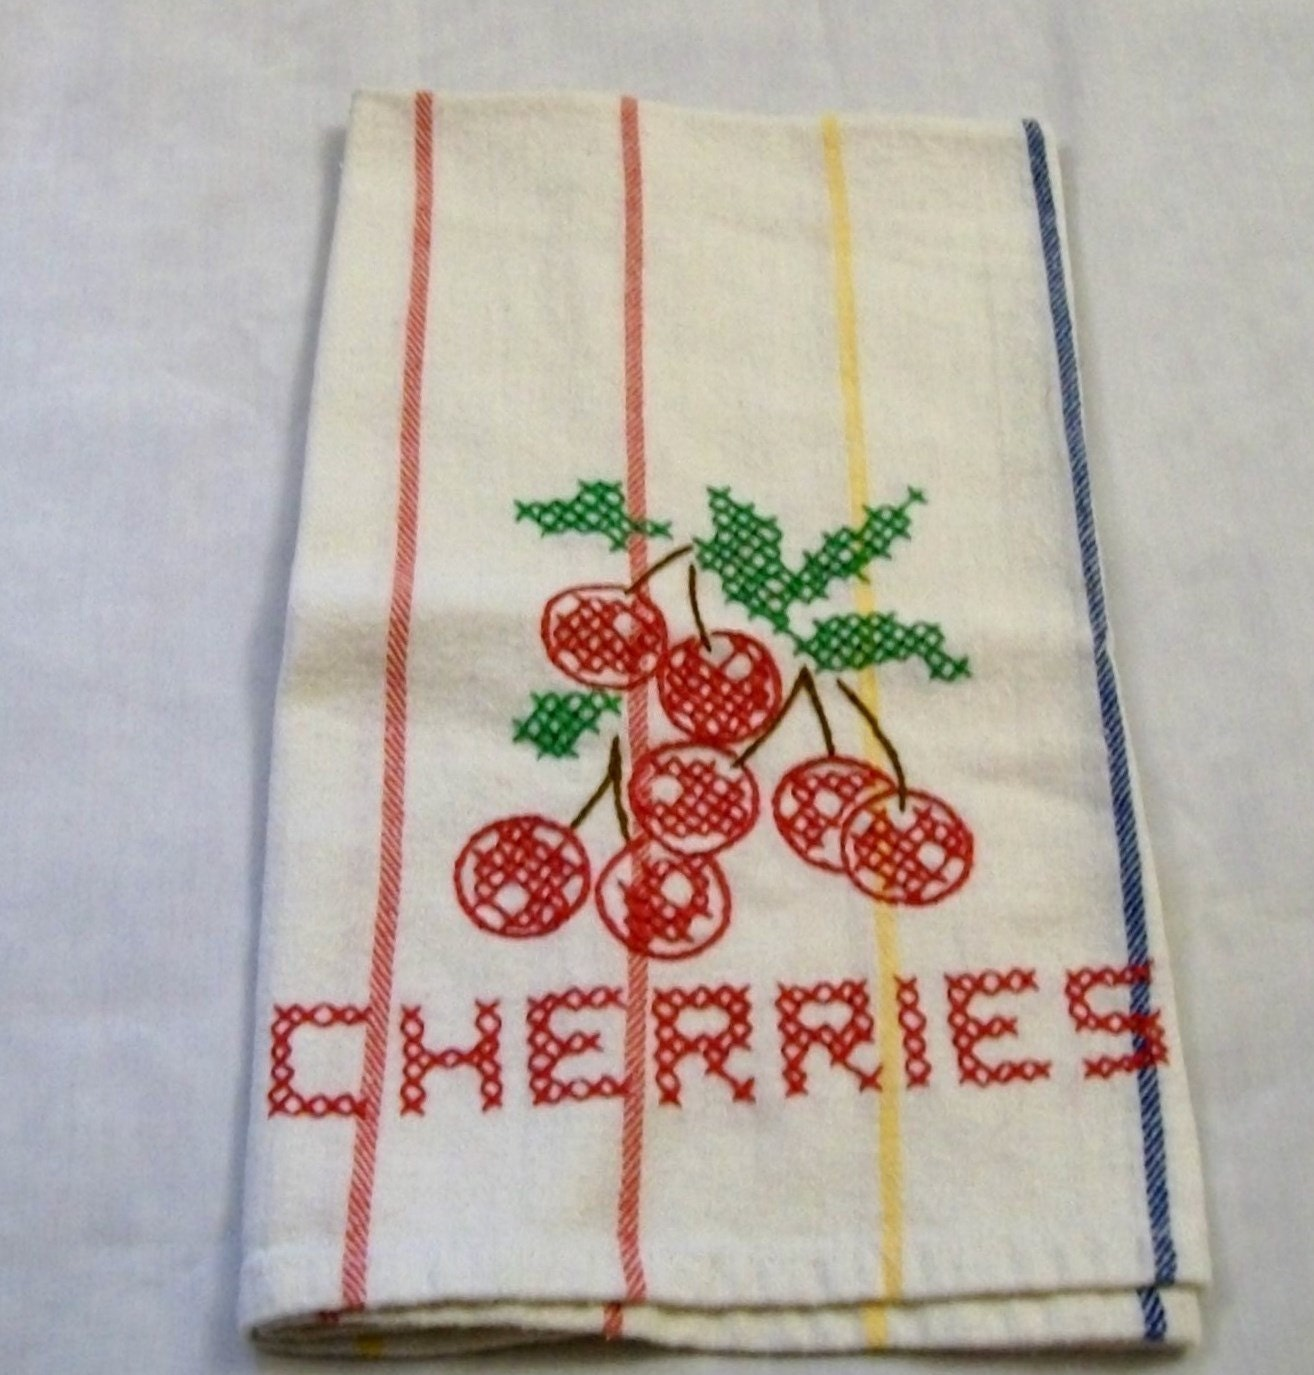 Embroidered Towels Custom: Kitchen Dish Towel Hand Embroidered Dish Towels Cherries